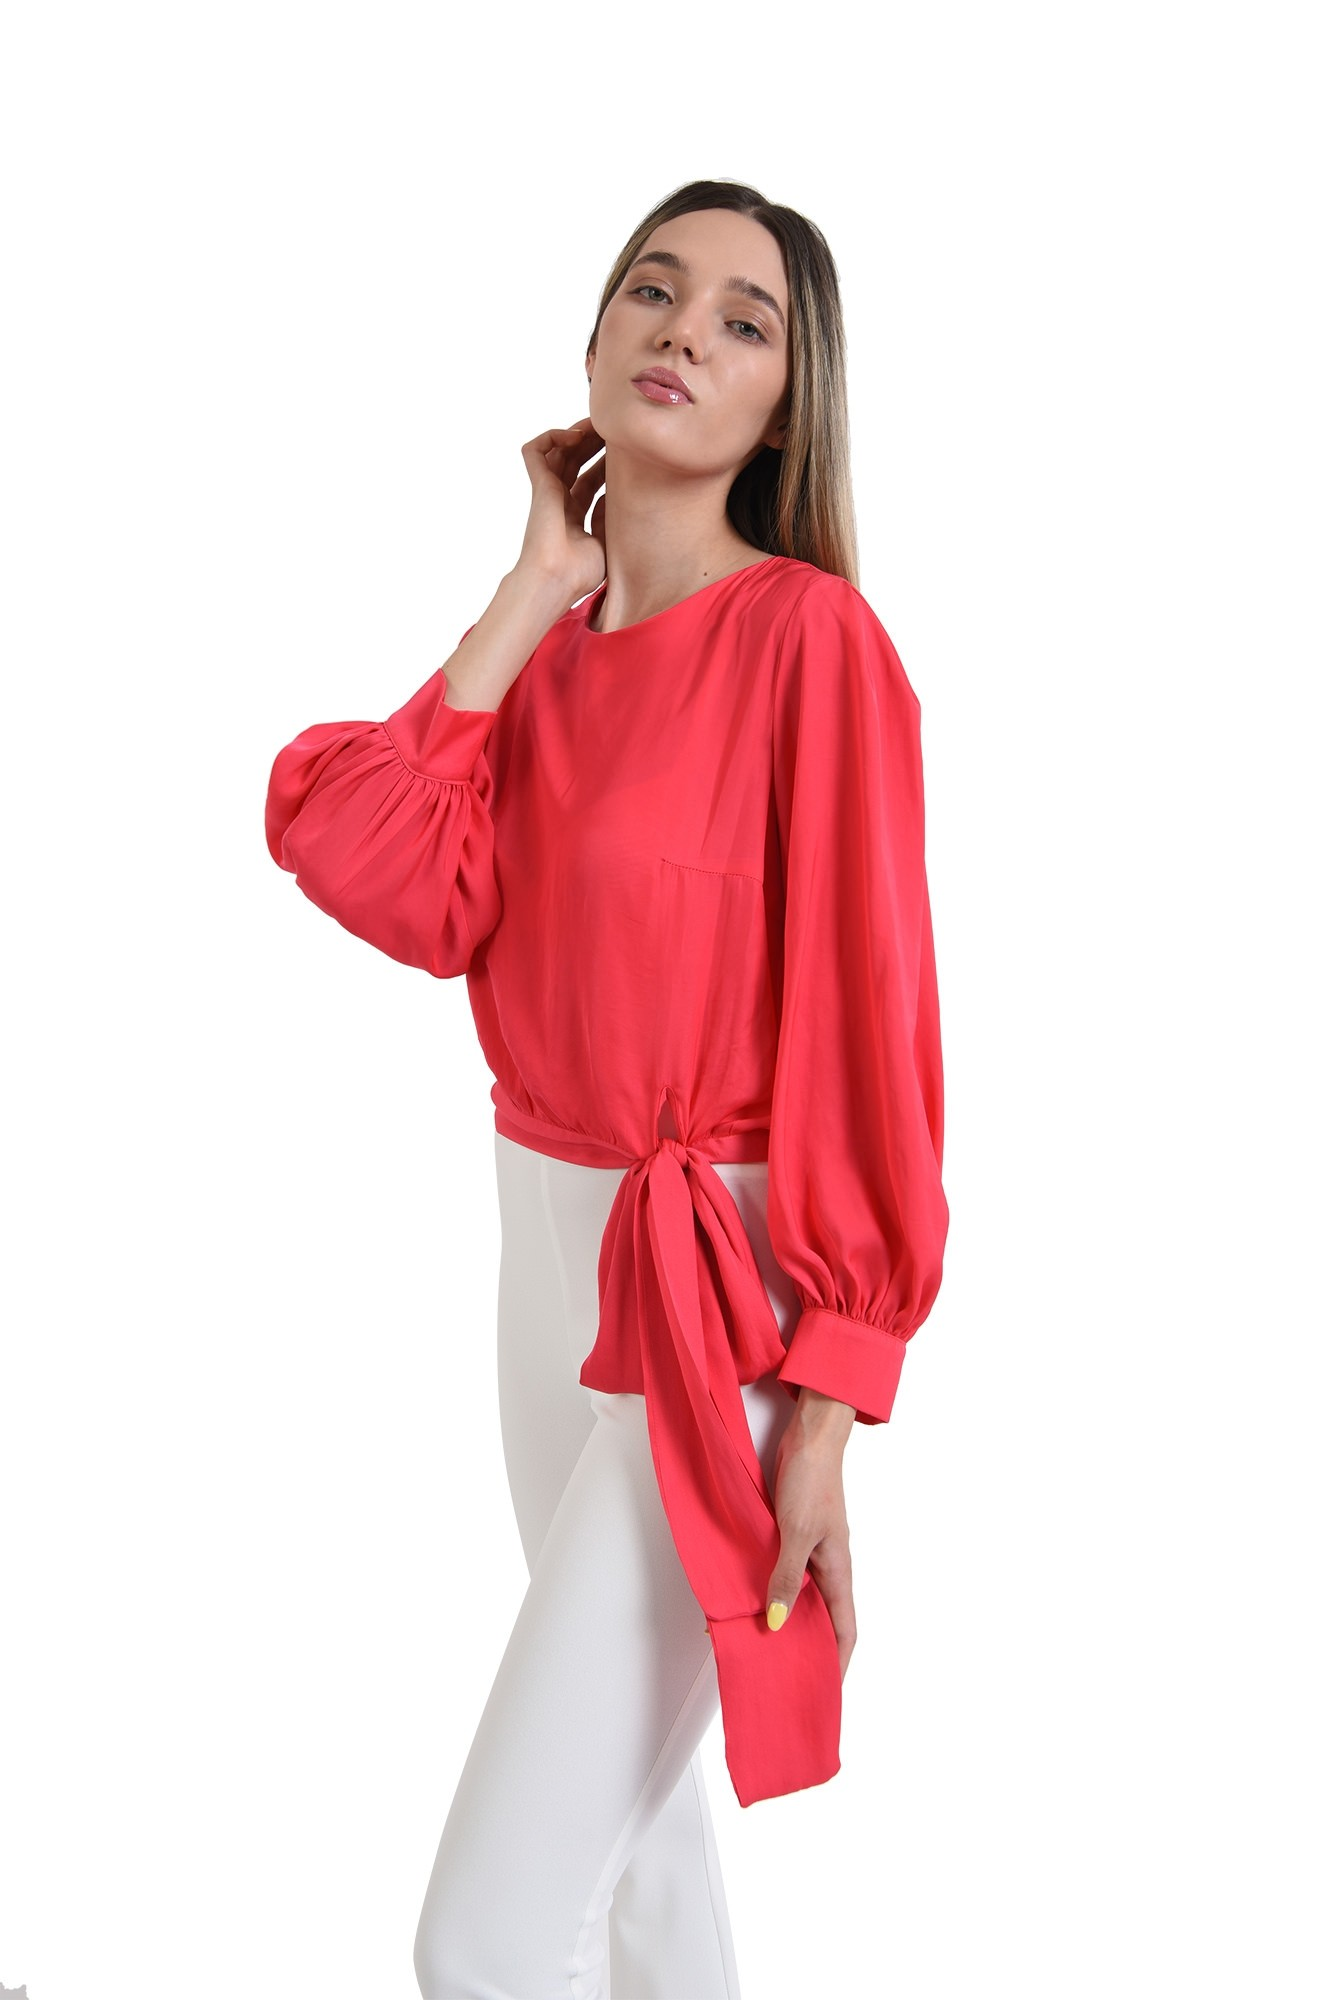 0 - bluza eleganta, poema, fucsia, satin